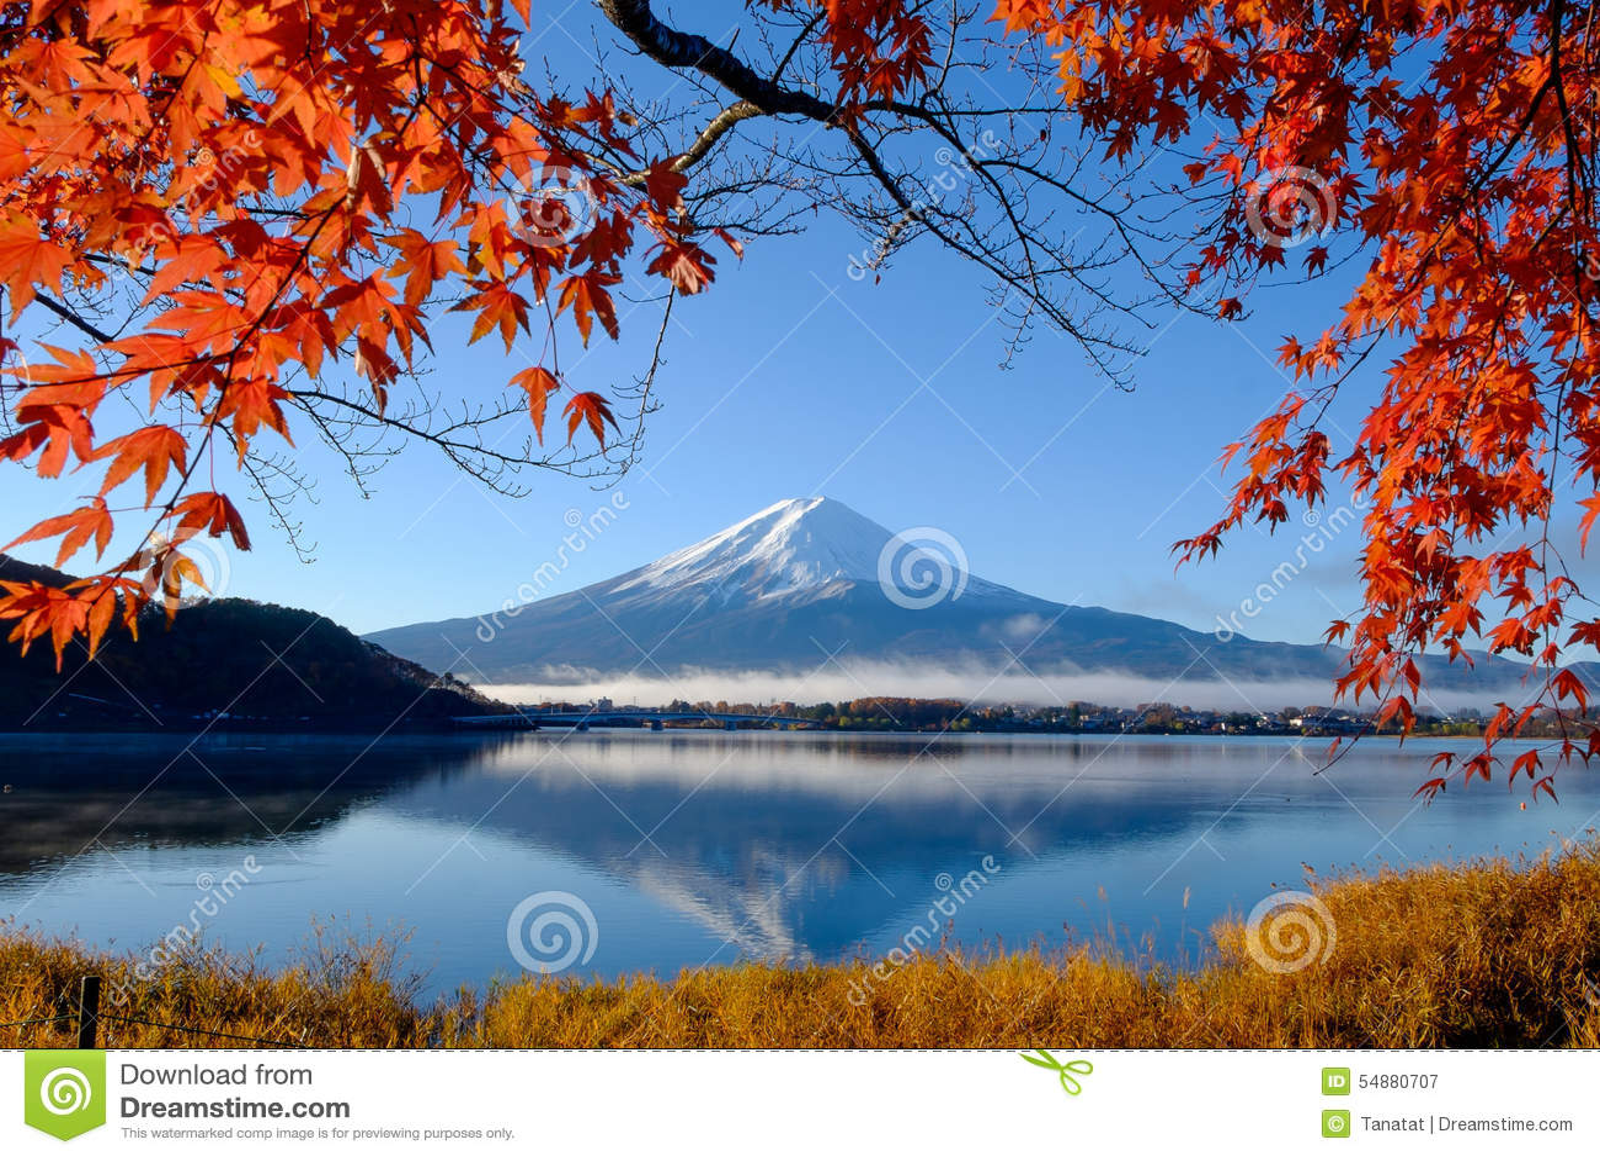 Mount Fuji Wallpaper Iphone Mt Fuji And Autumn Foliage At Lake Kawaguchi Stock Image